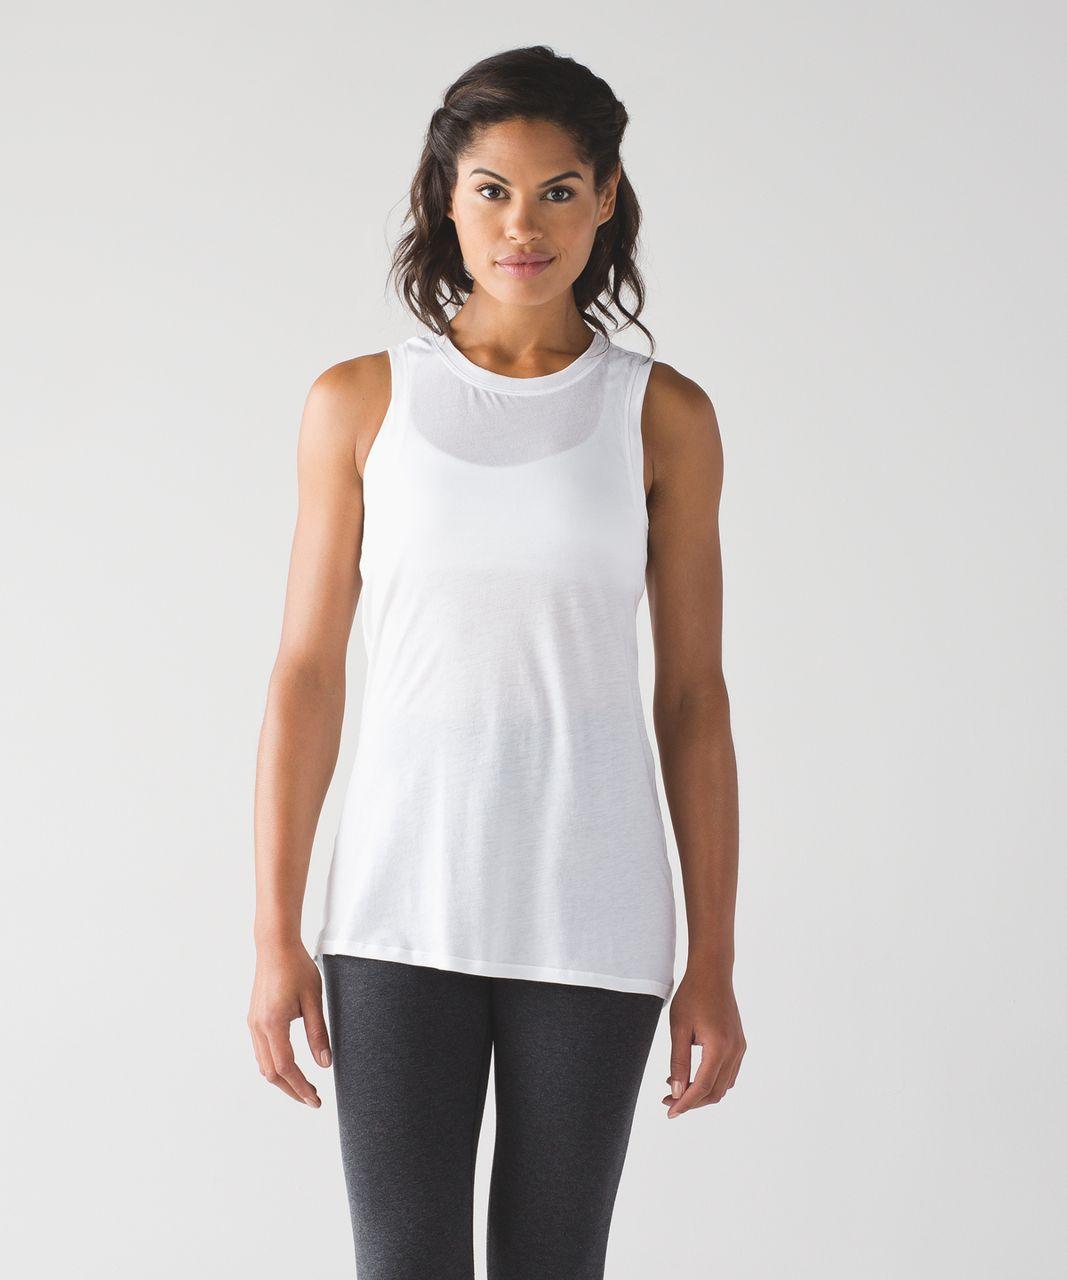 Lululemon Bend And Twist Tank - White